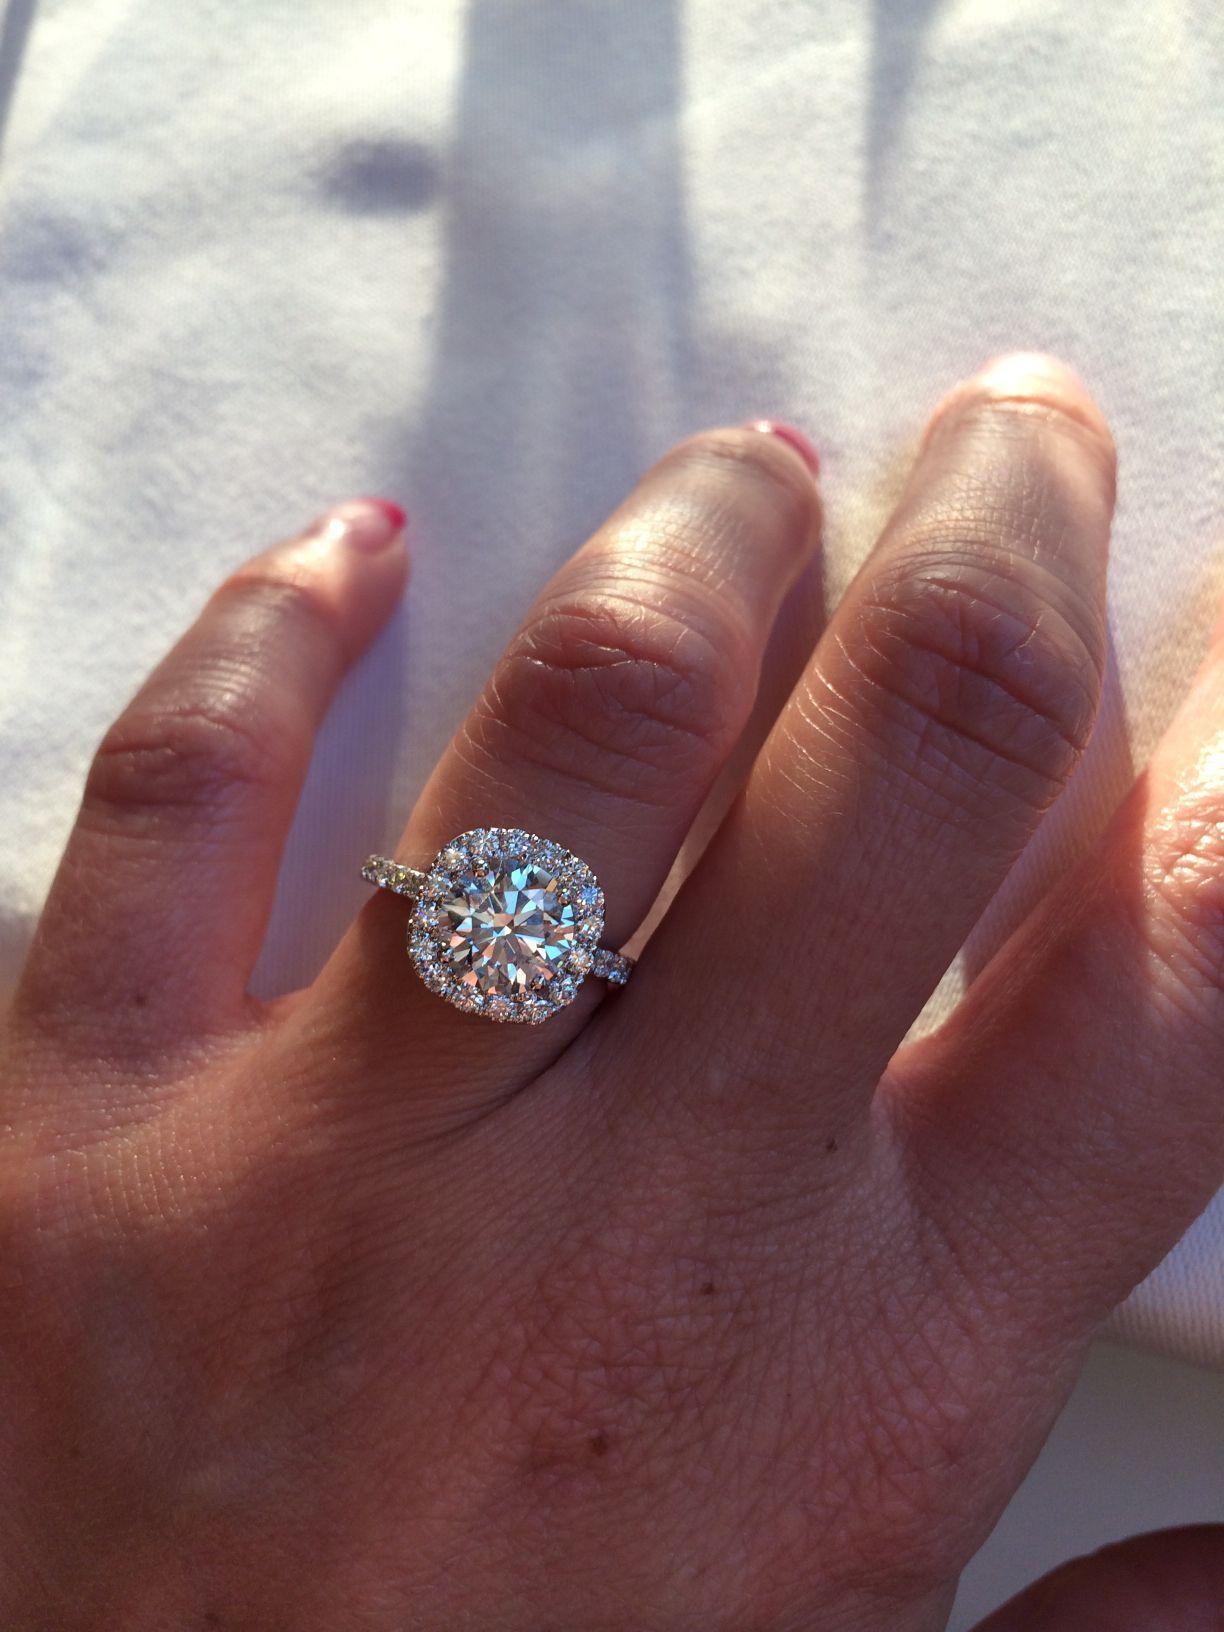 Show Me Your 1 5 Plus Ct Round Diamond In Cushion Halo Help Weddingbe Round Diamond Engagement Rings Round Halo Engagement Rings Round Diamond Cushion Halo